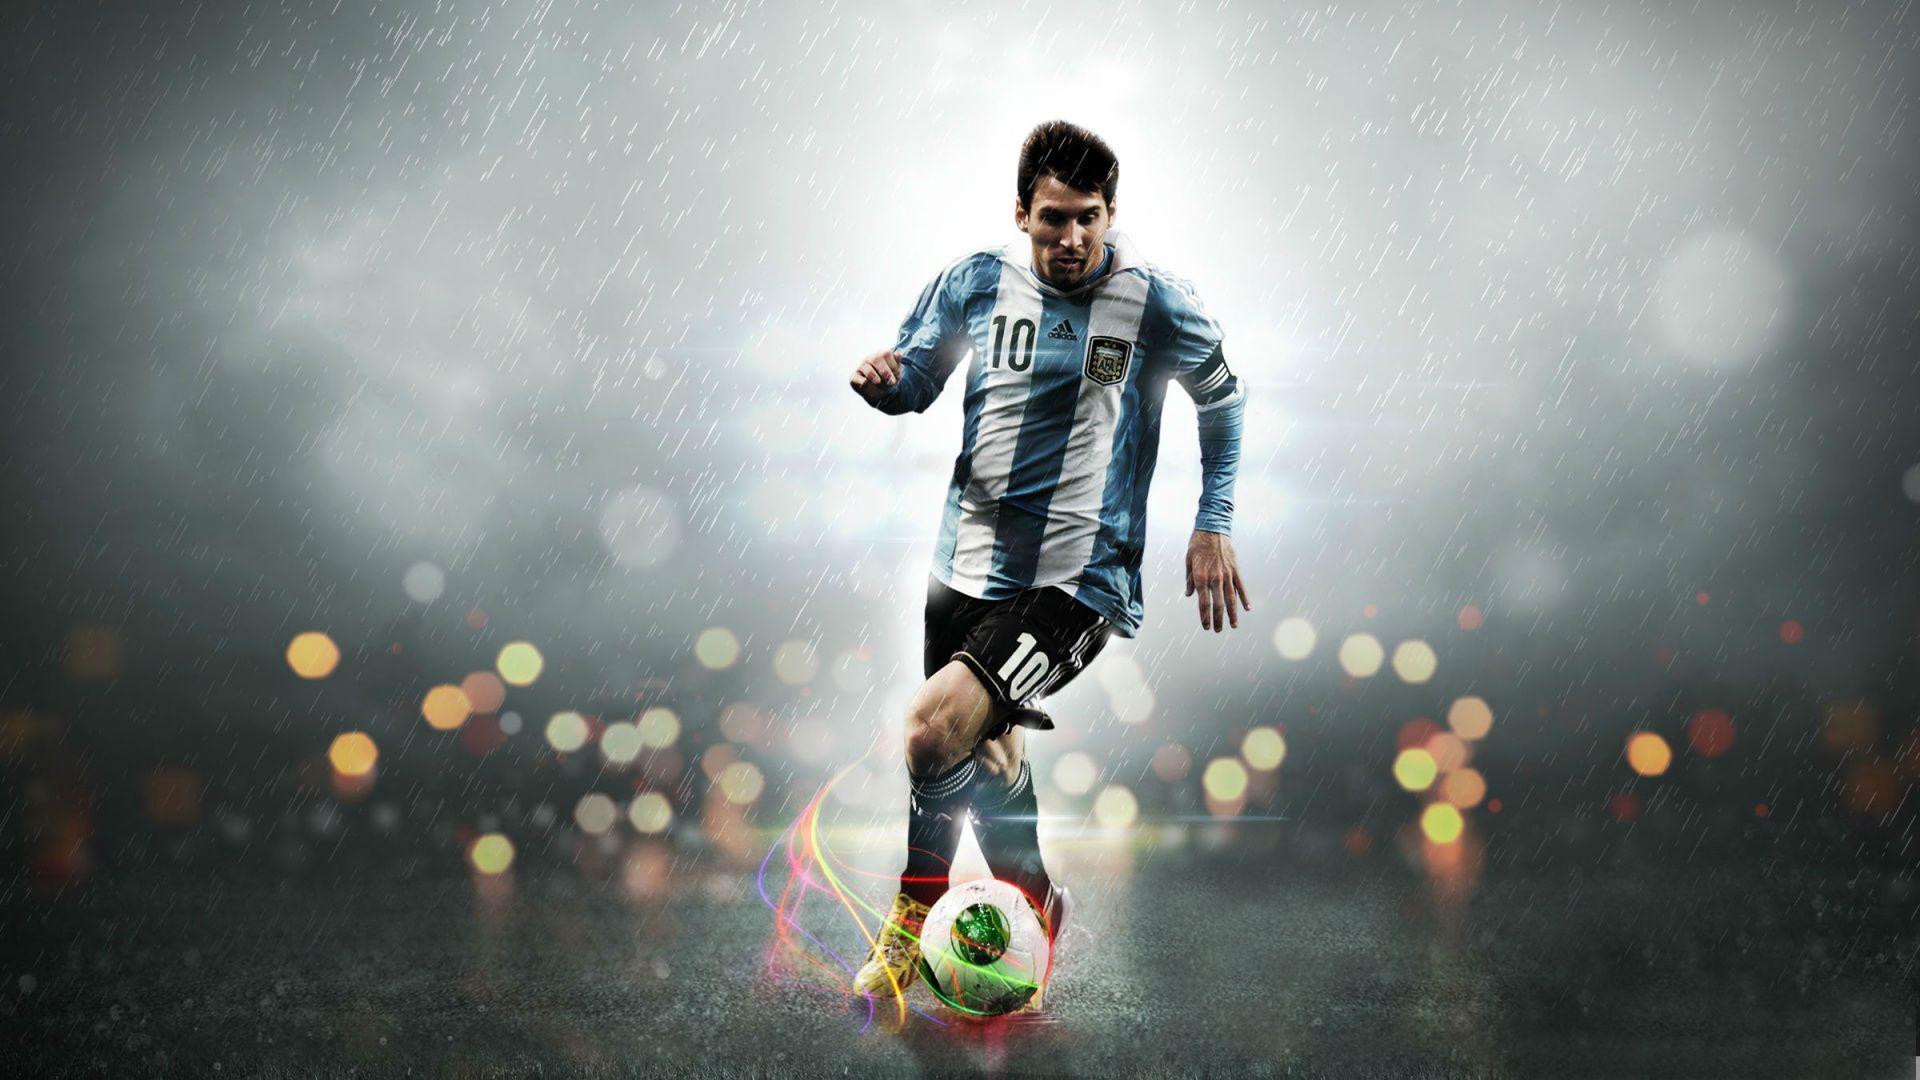 Soccer Player Wallpaper Lionel Messi Wallpapers Lionel Messi Lionel Messi Barcelona